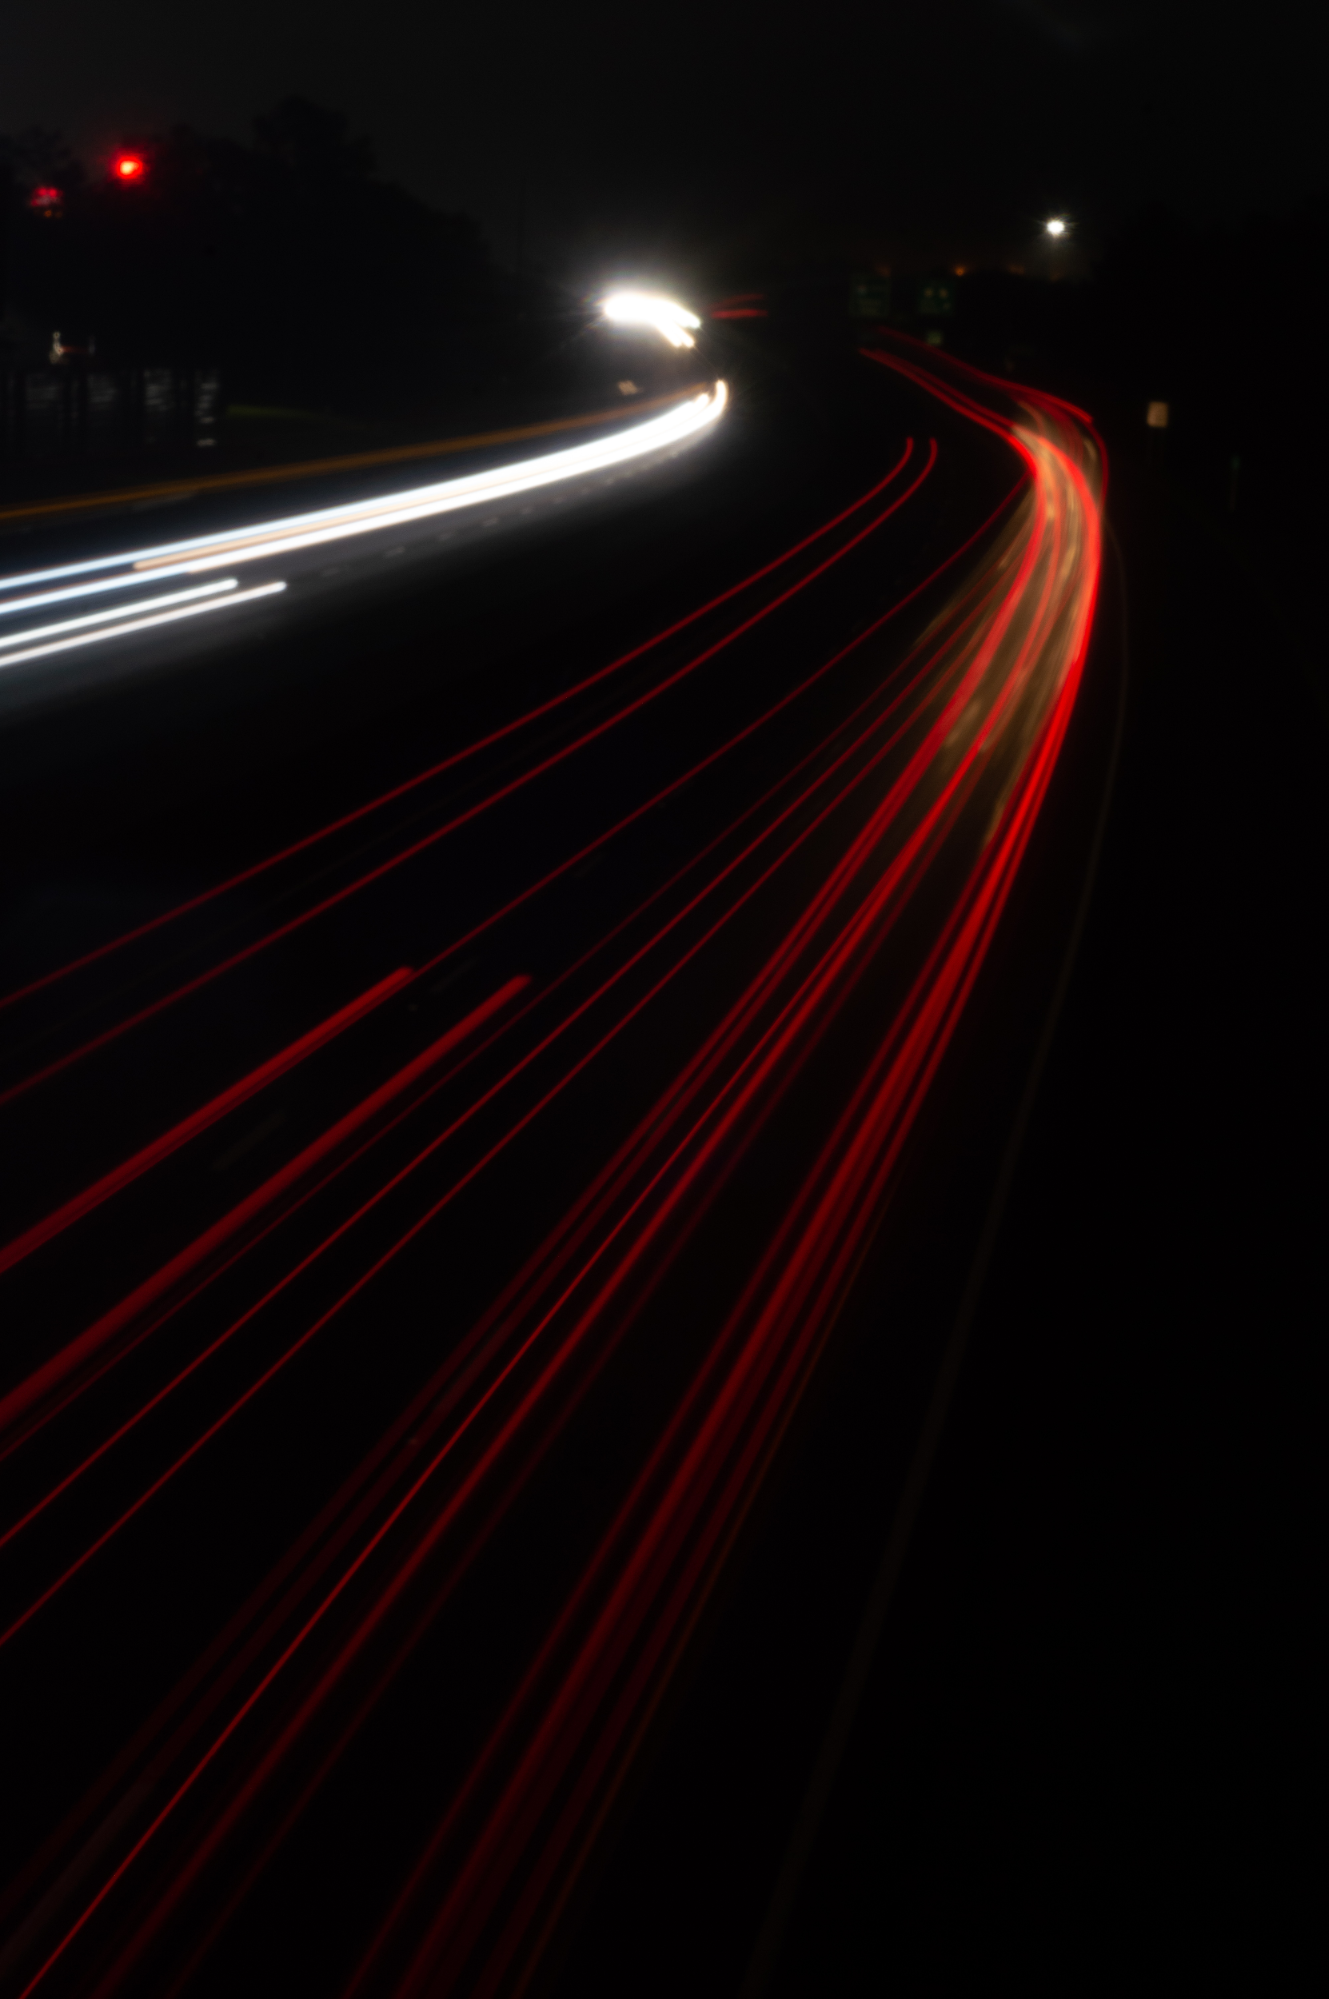 Night Photo Project